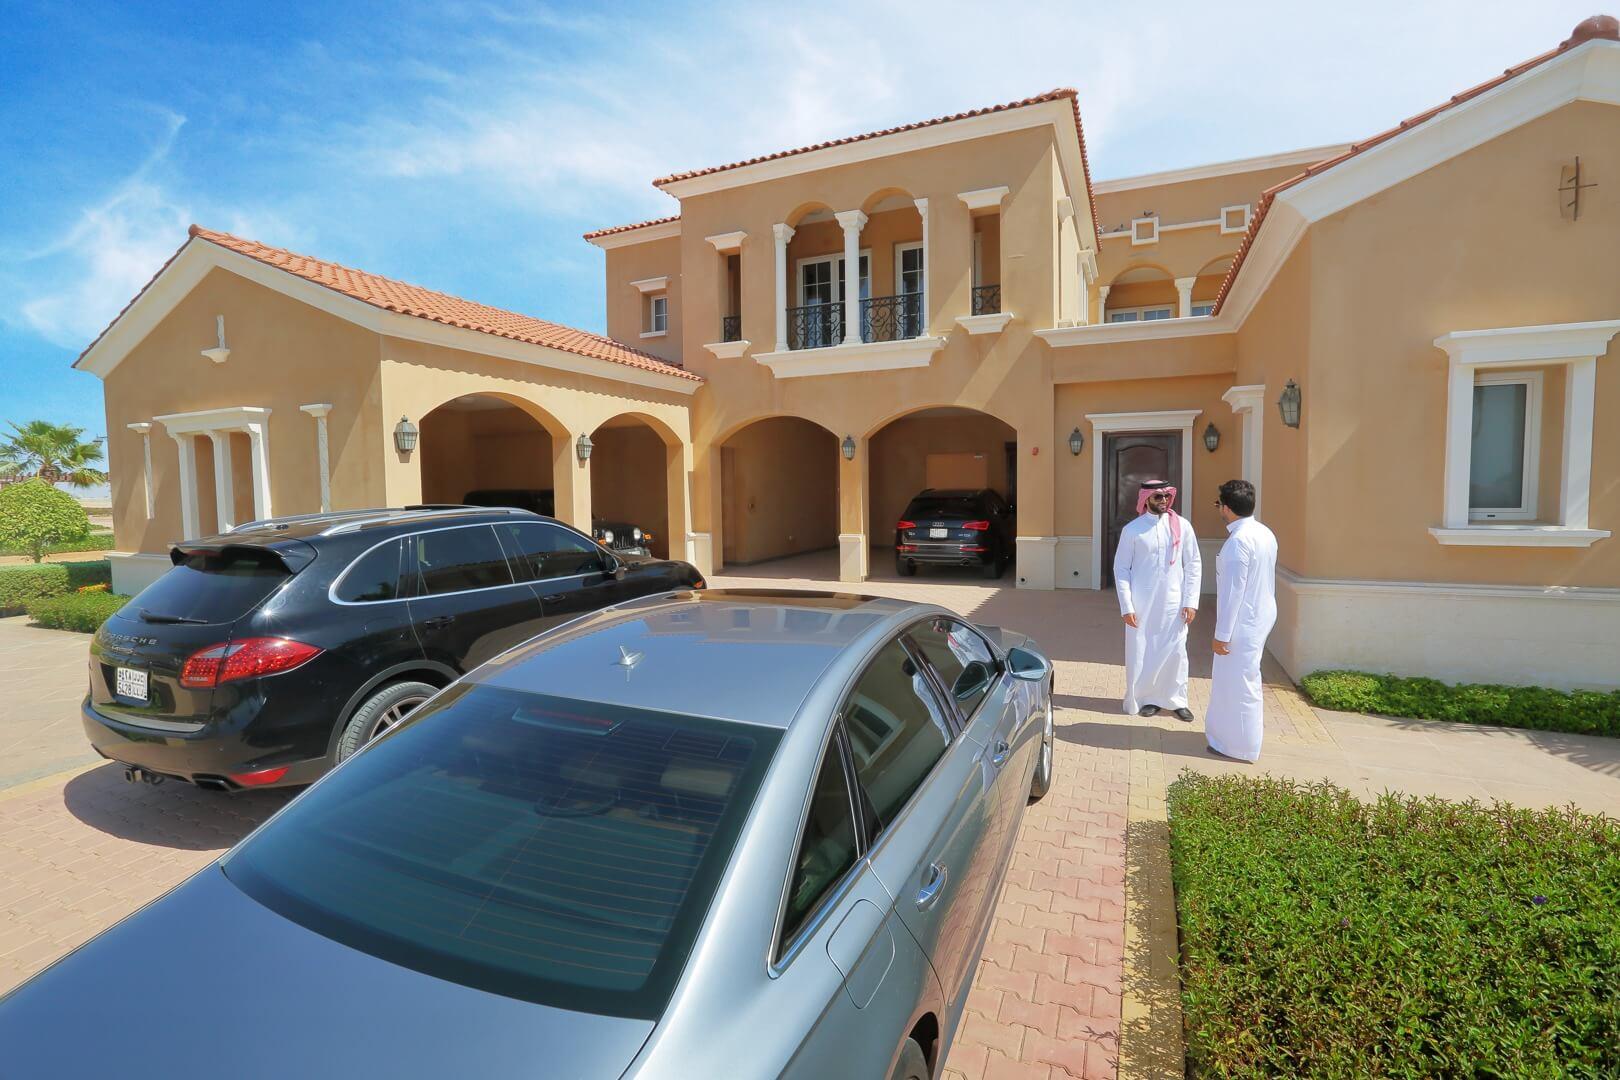 Al Murooj villa exterior - KAEC